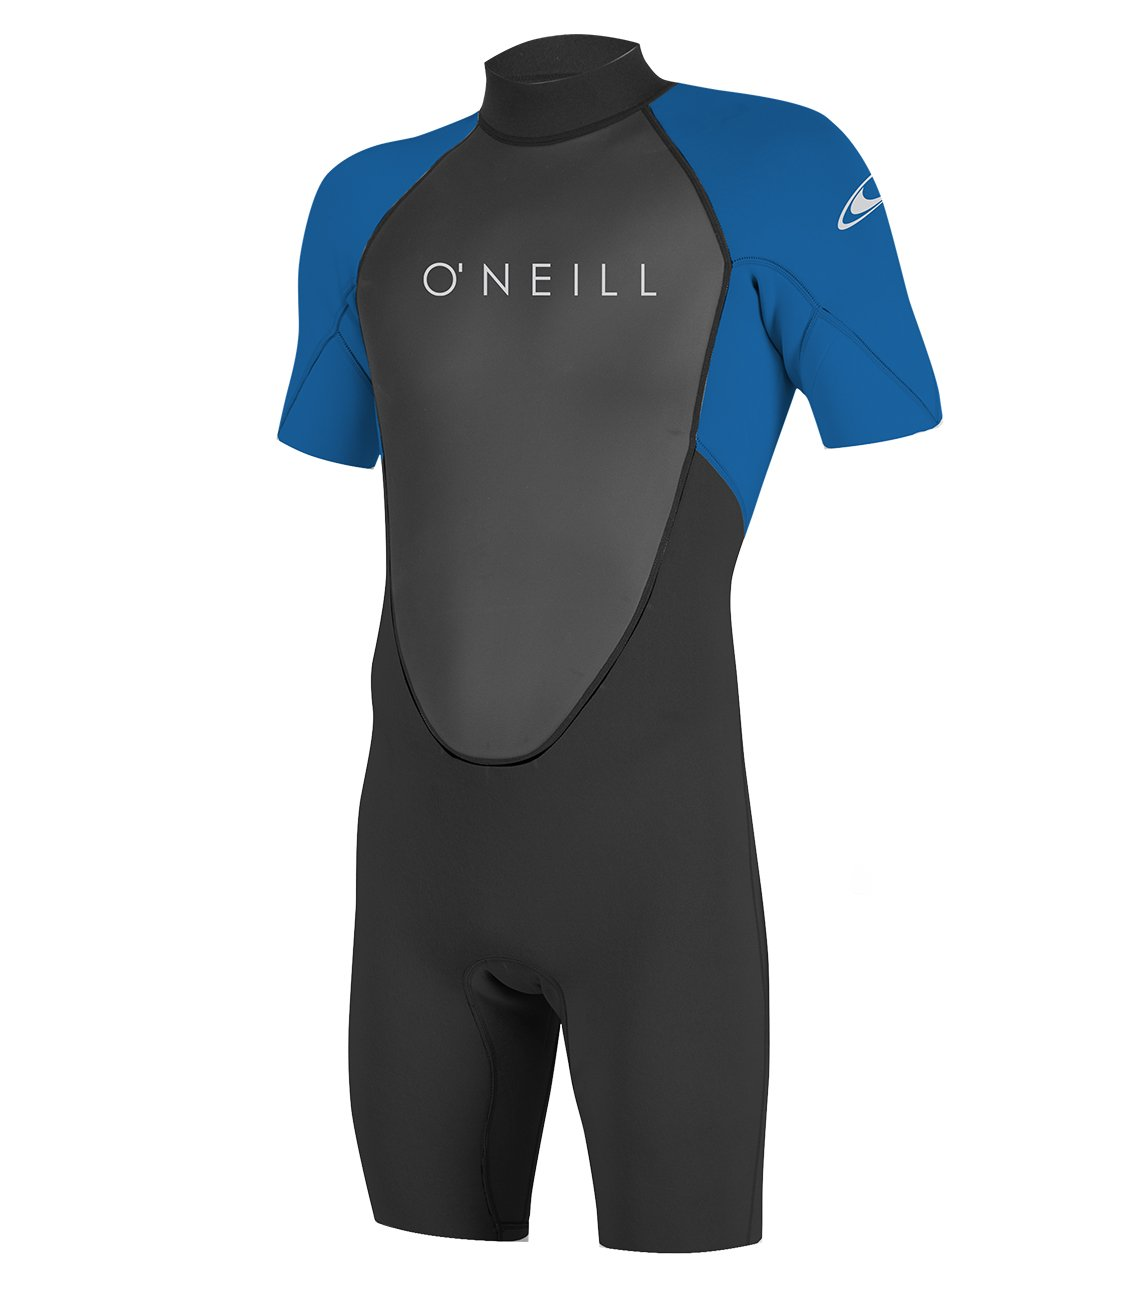 O'Neill Men's Reactor-2 2mm Back Zip Short Sleeve Spring Wetsuit, Black/Ocean, Medium